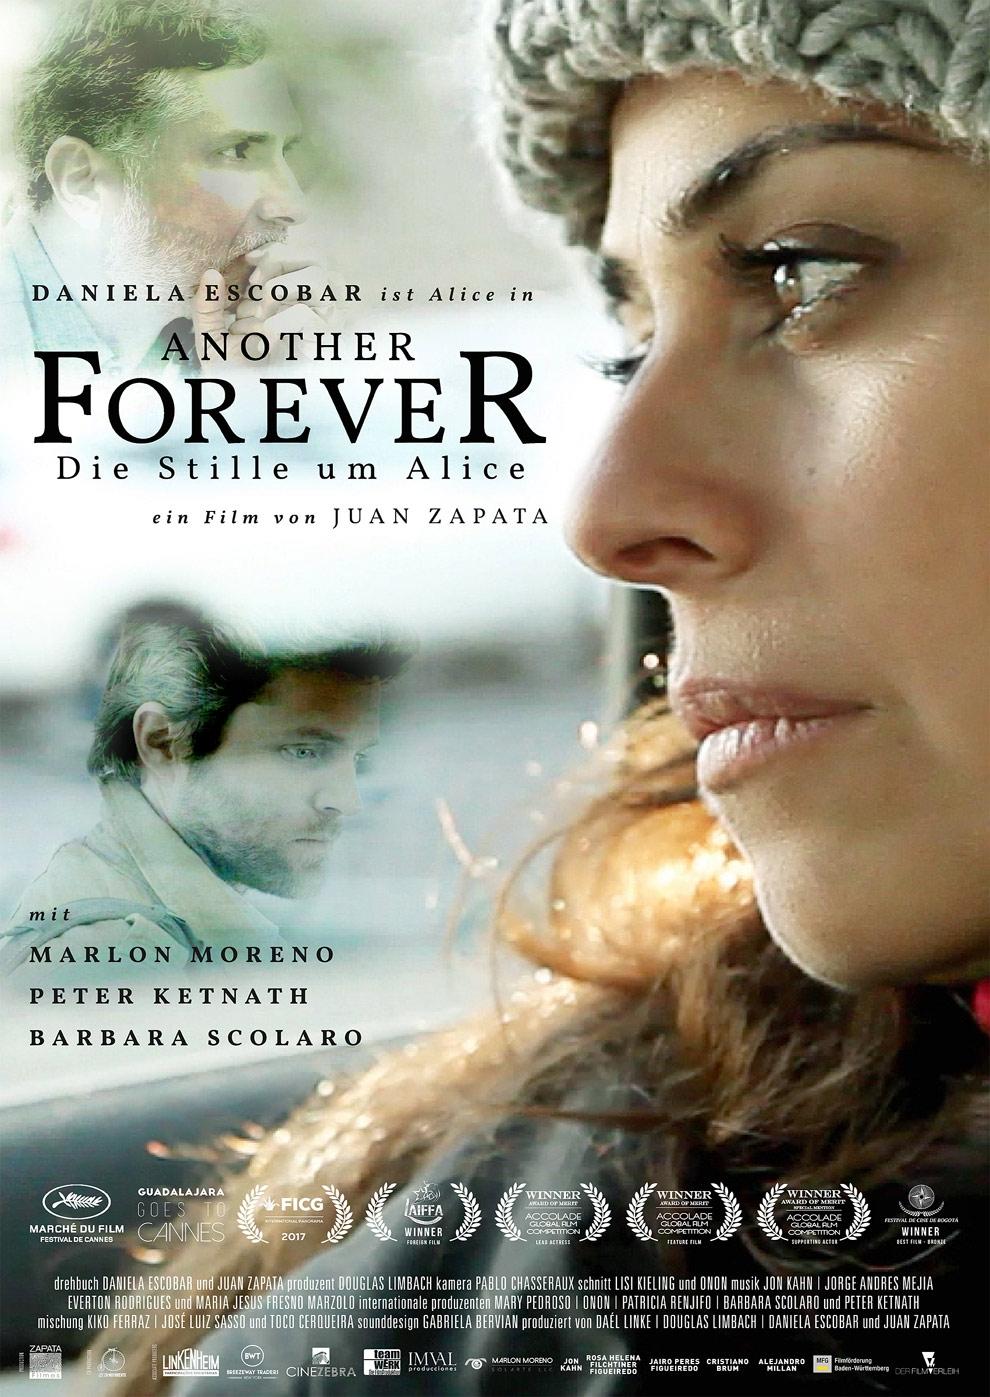 Another Forever - Die Stille um Alice (Poster)